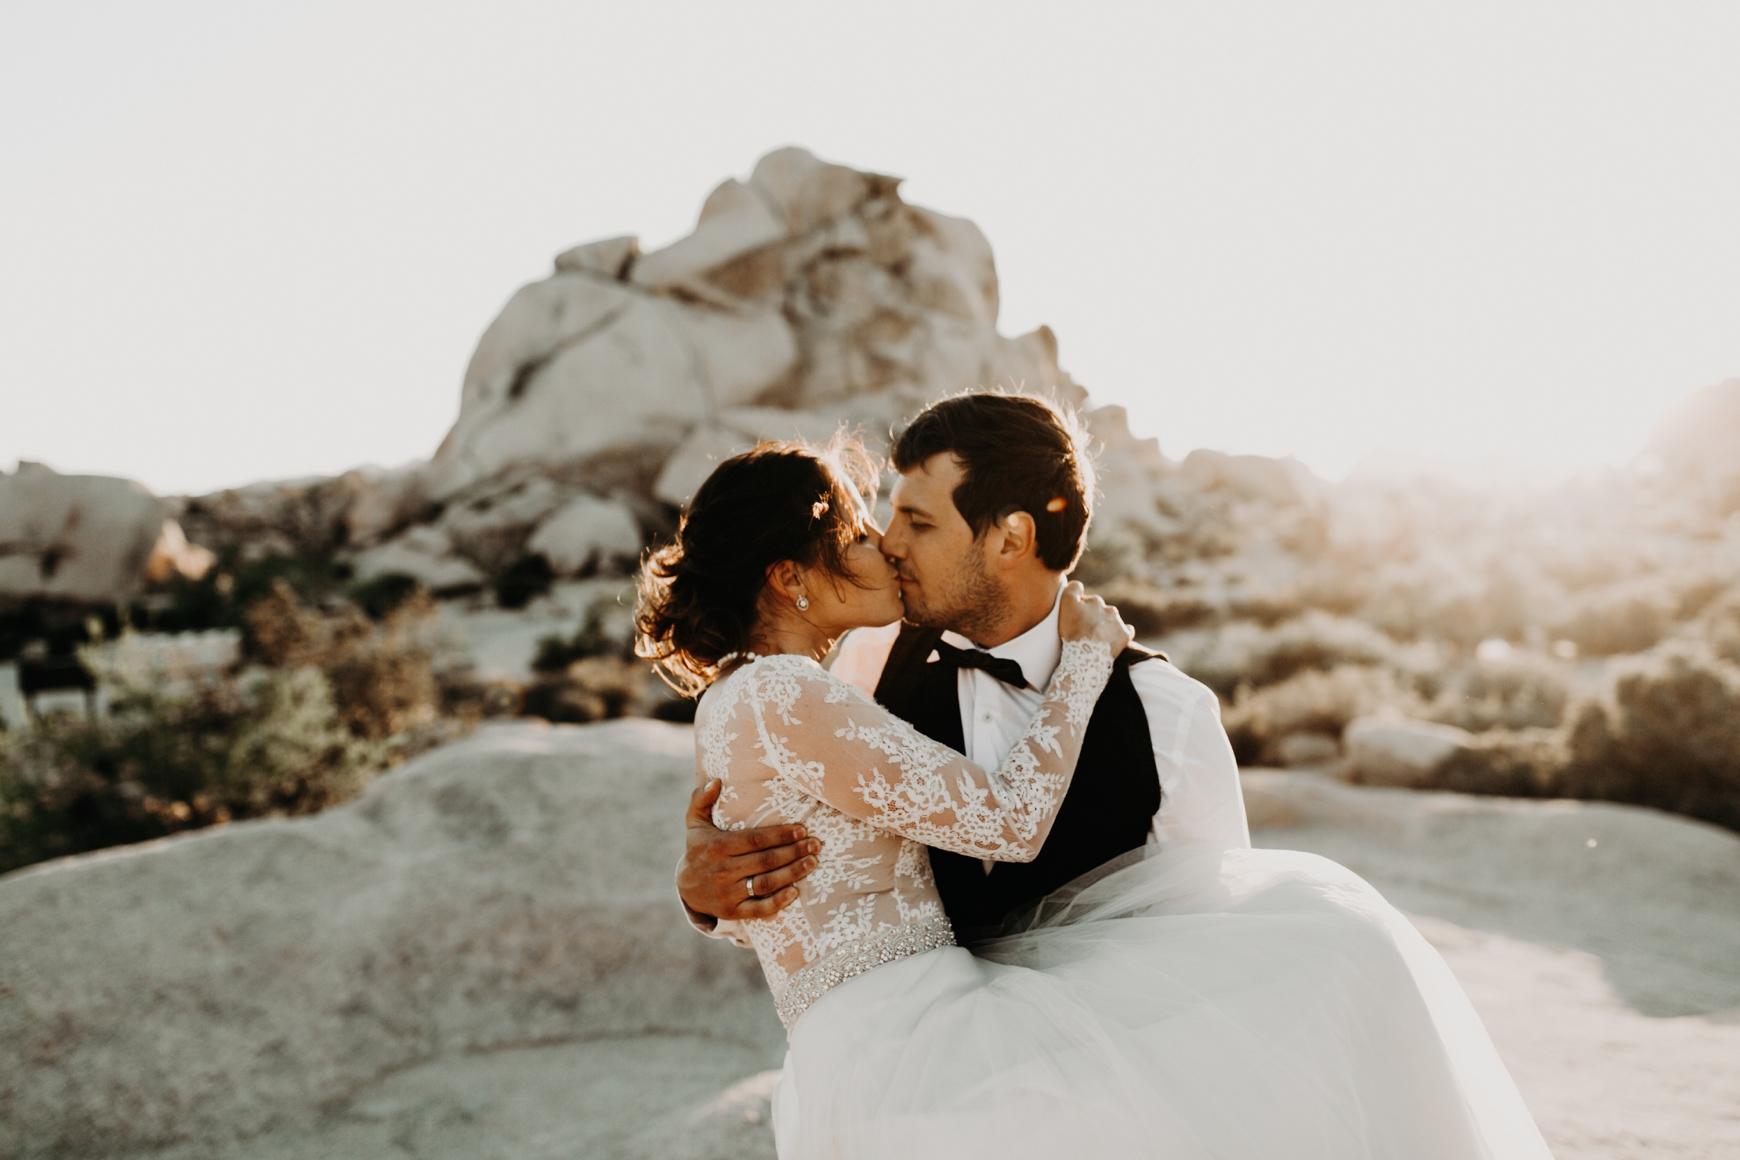 Joshua Tree Bridal Portraits Anastasia & Andrey Emily Magers Photography-273.jpg